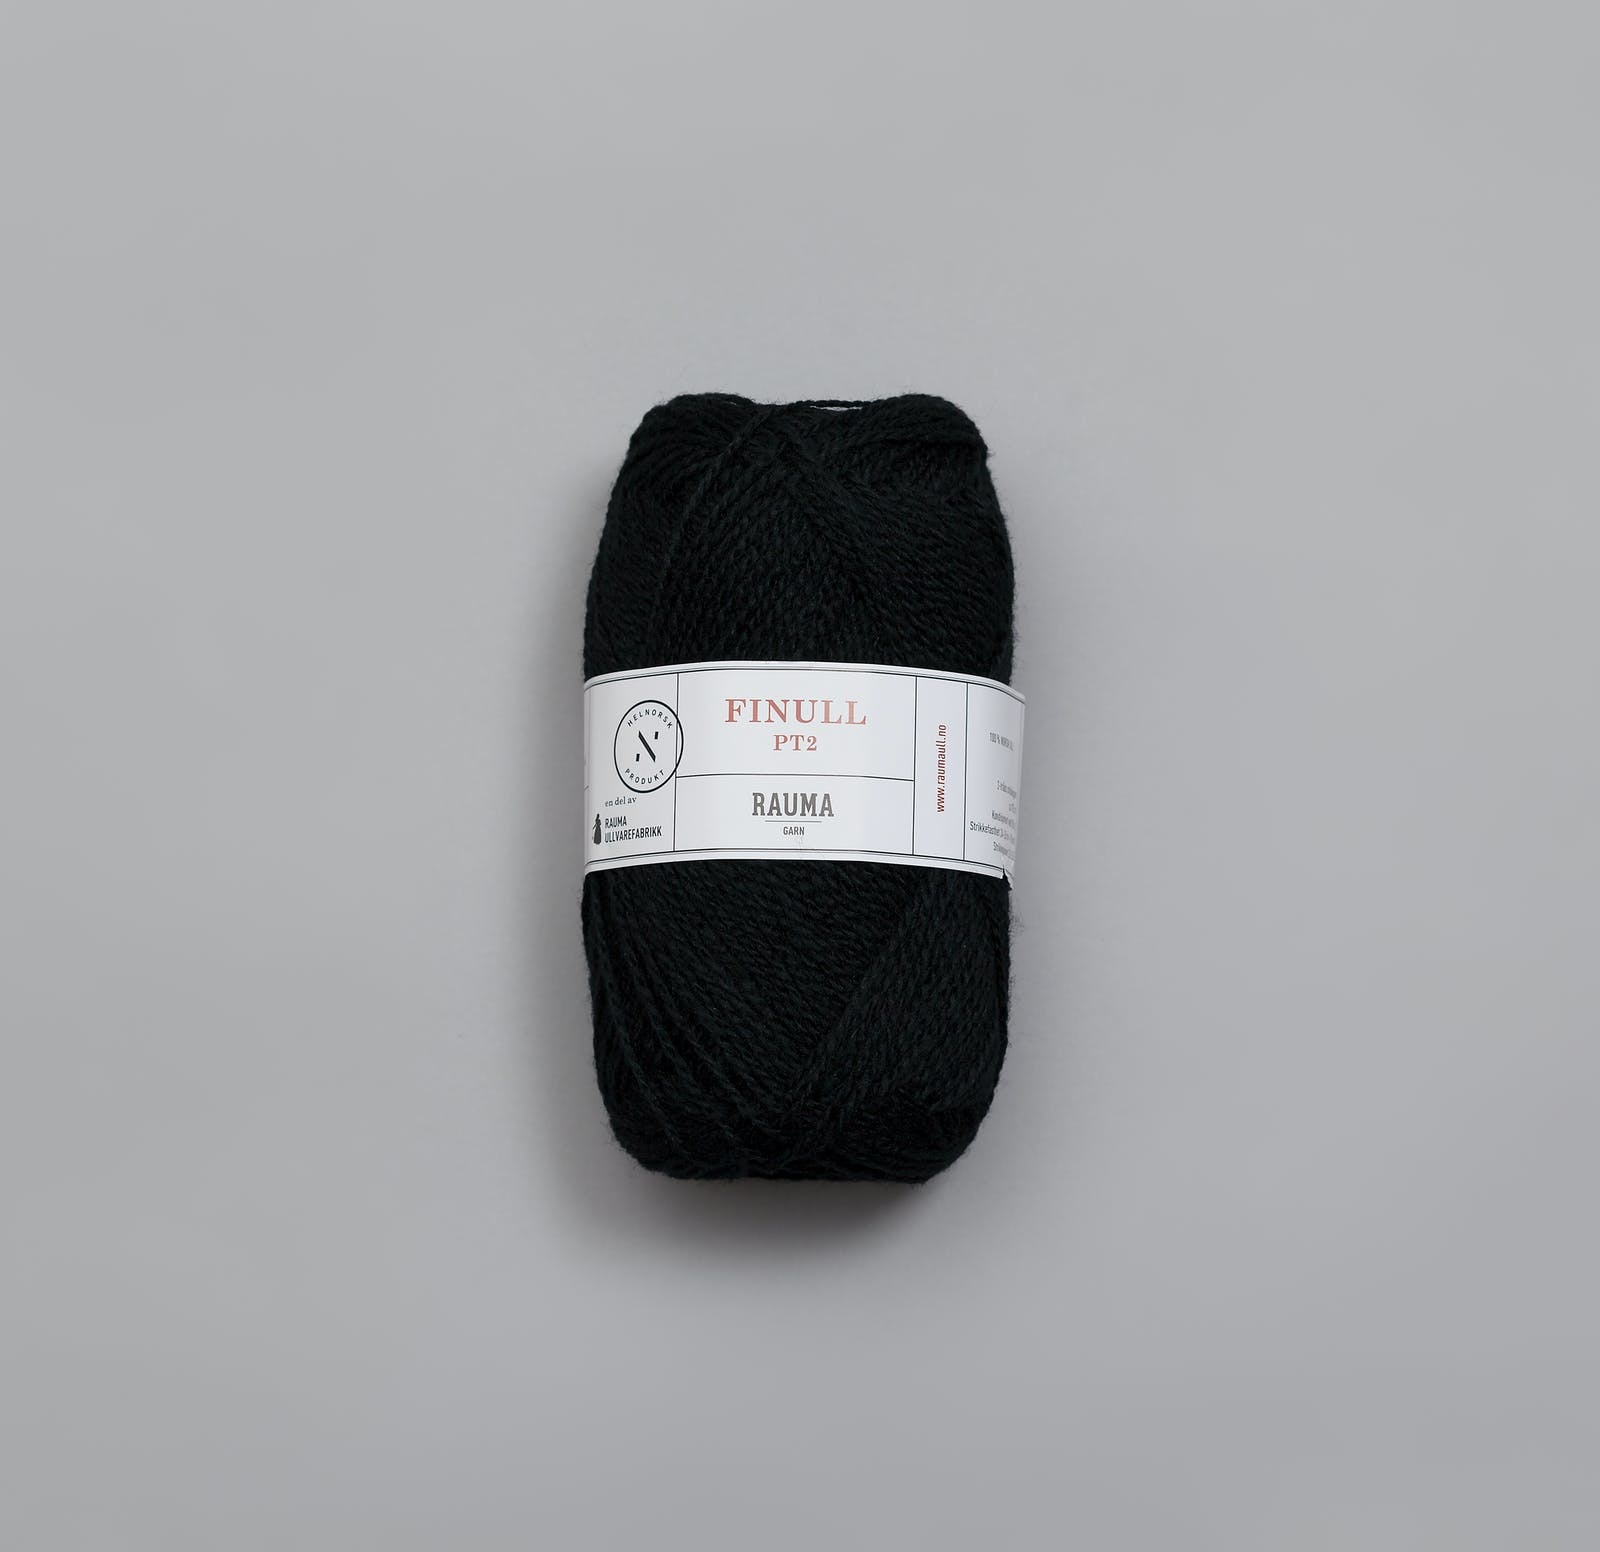 Rauma Finull melert - 436 - svart